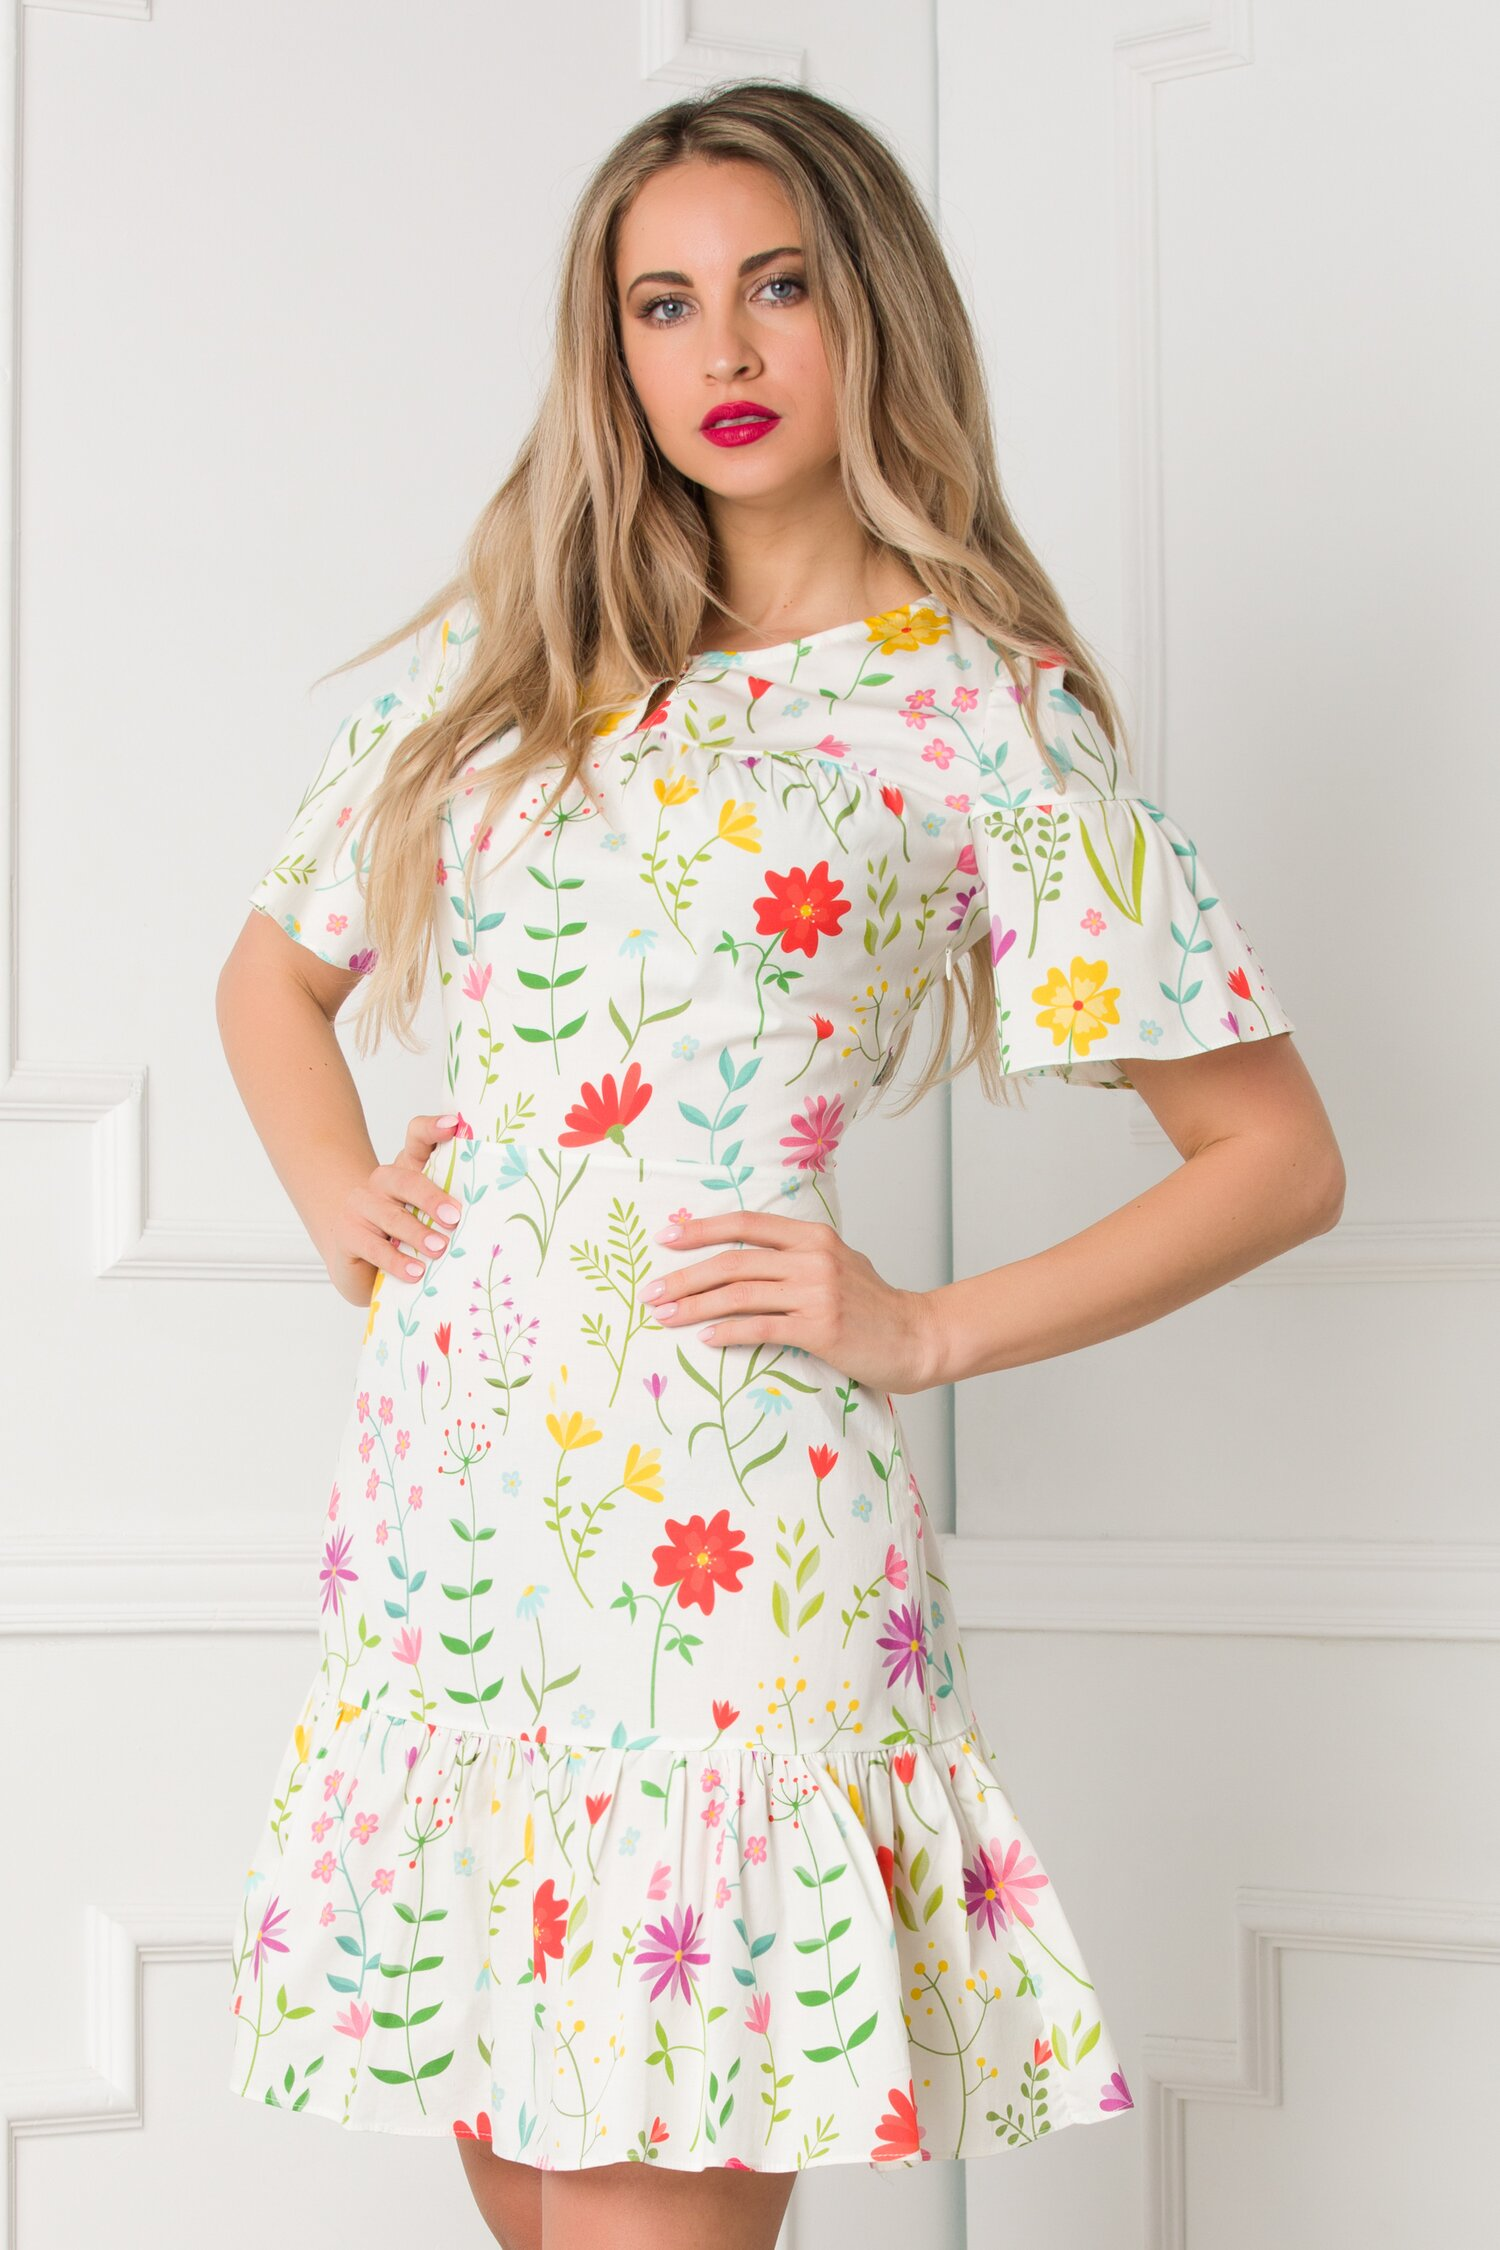 Rochie Yvy alba cu imprimeuri florale colorate